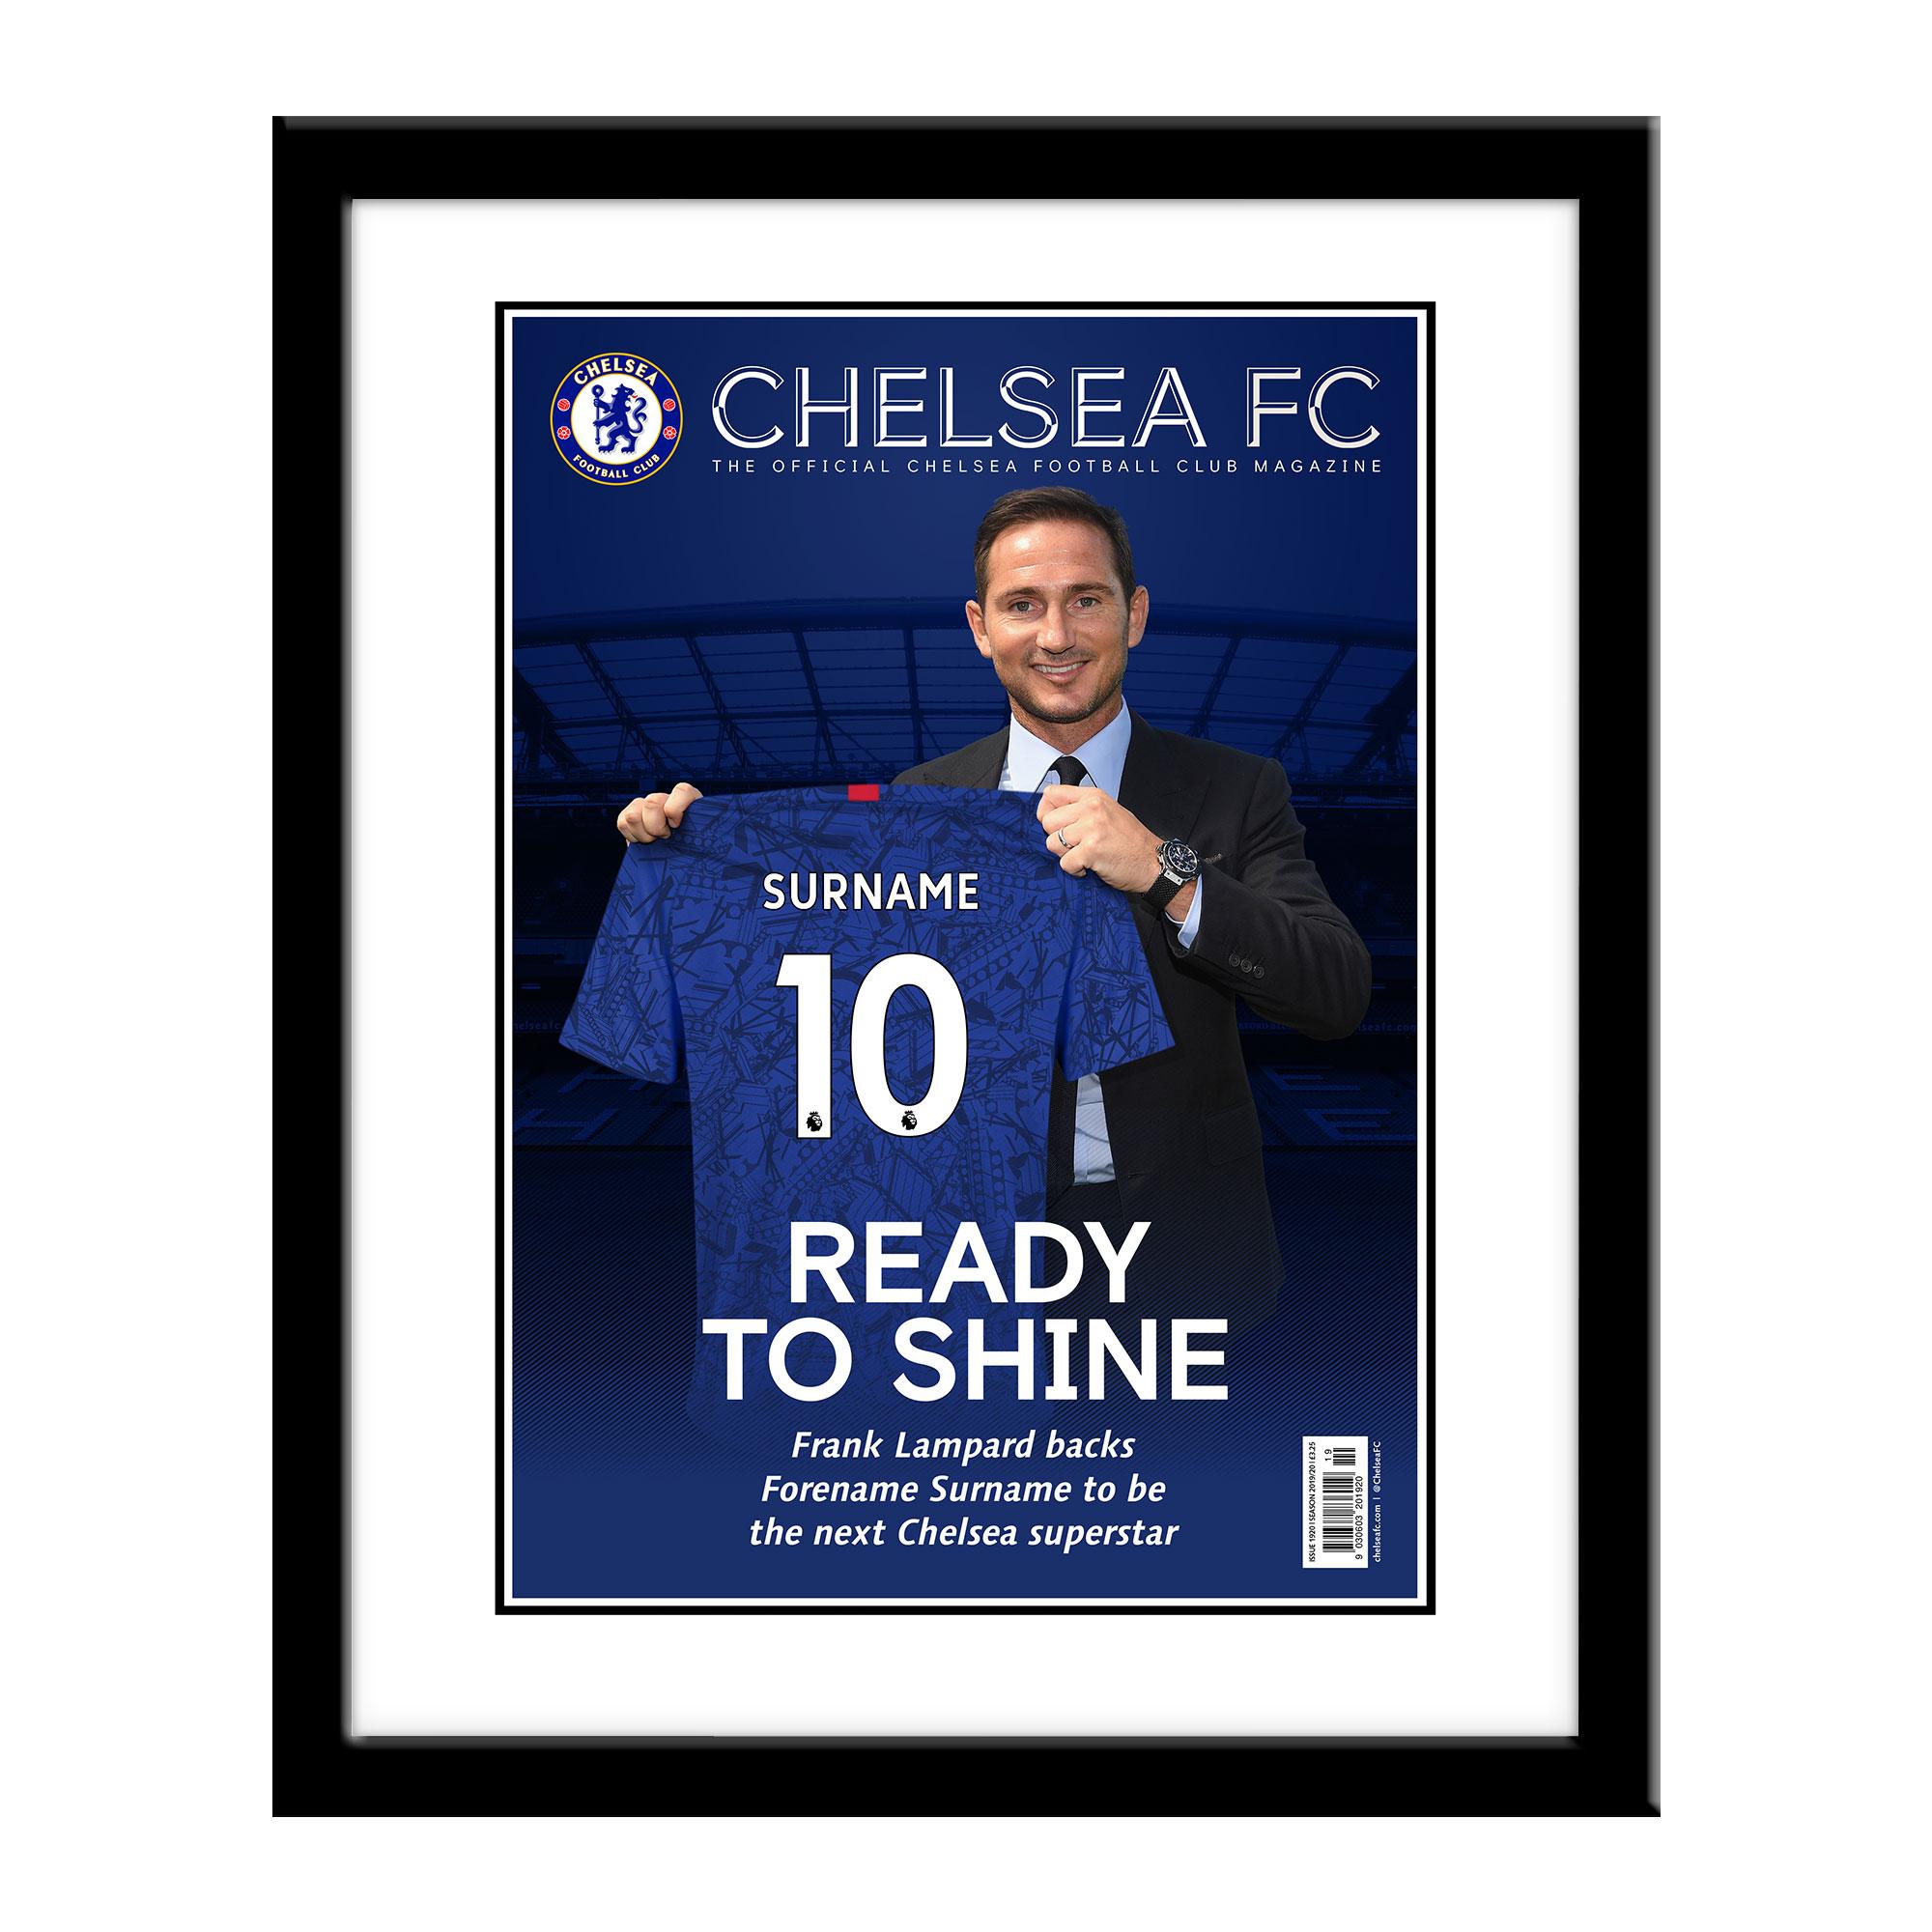 Chelsea FC Magazine Front Cover Framed Print